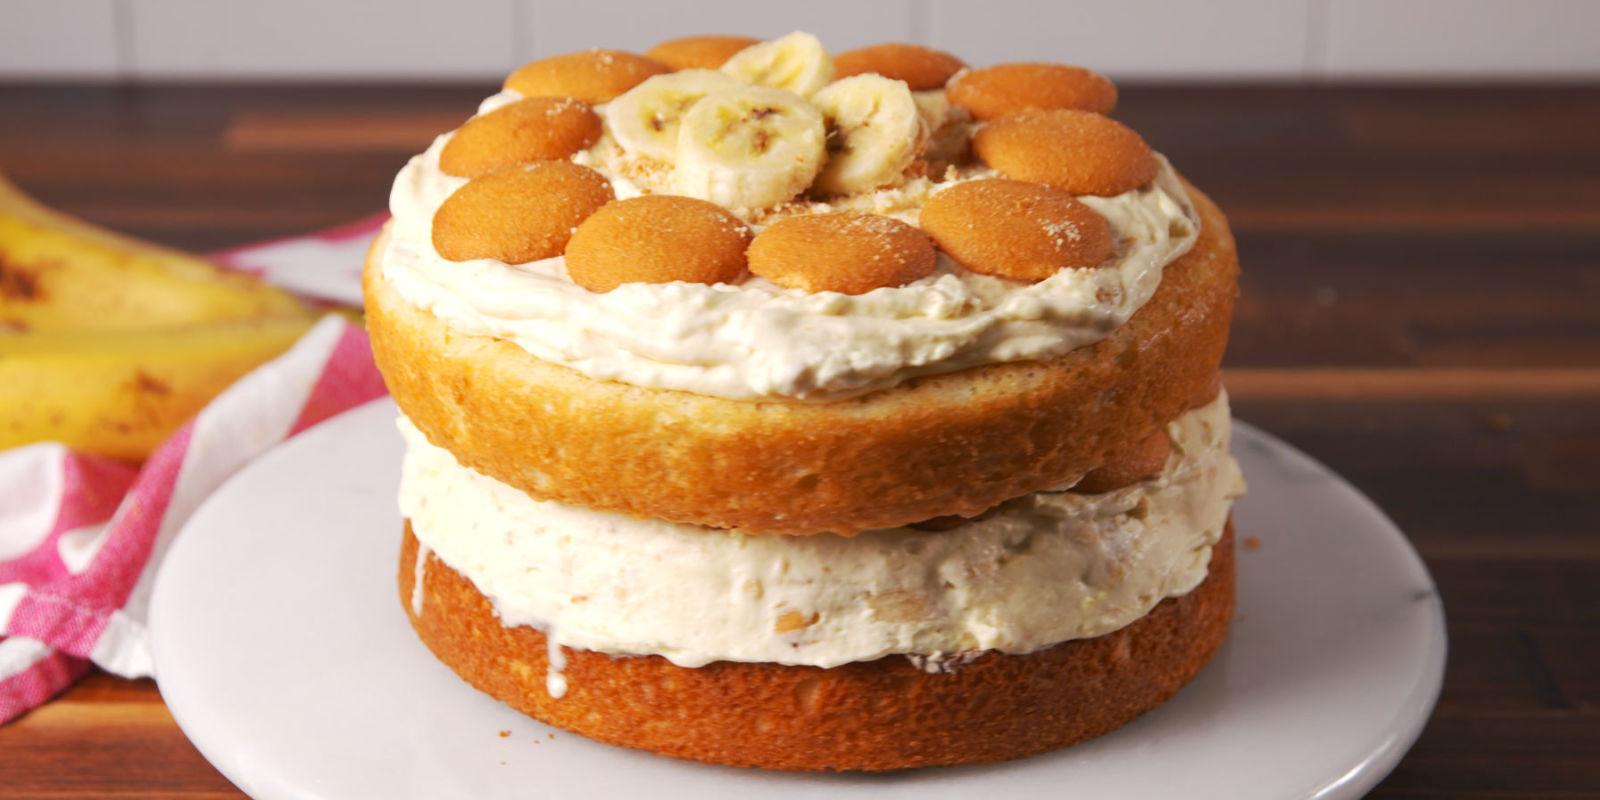 The Best Banana Pudding Ice Cream Cake Recipe How To Make Banana Pudding Ice Cream Cake